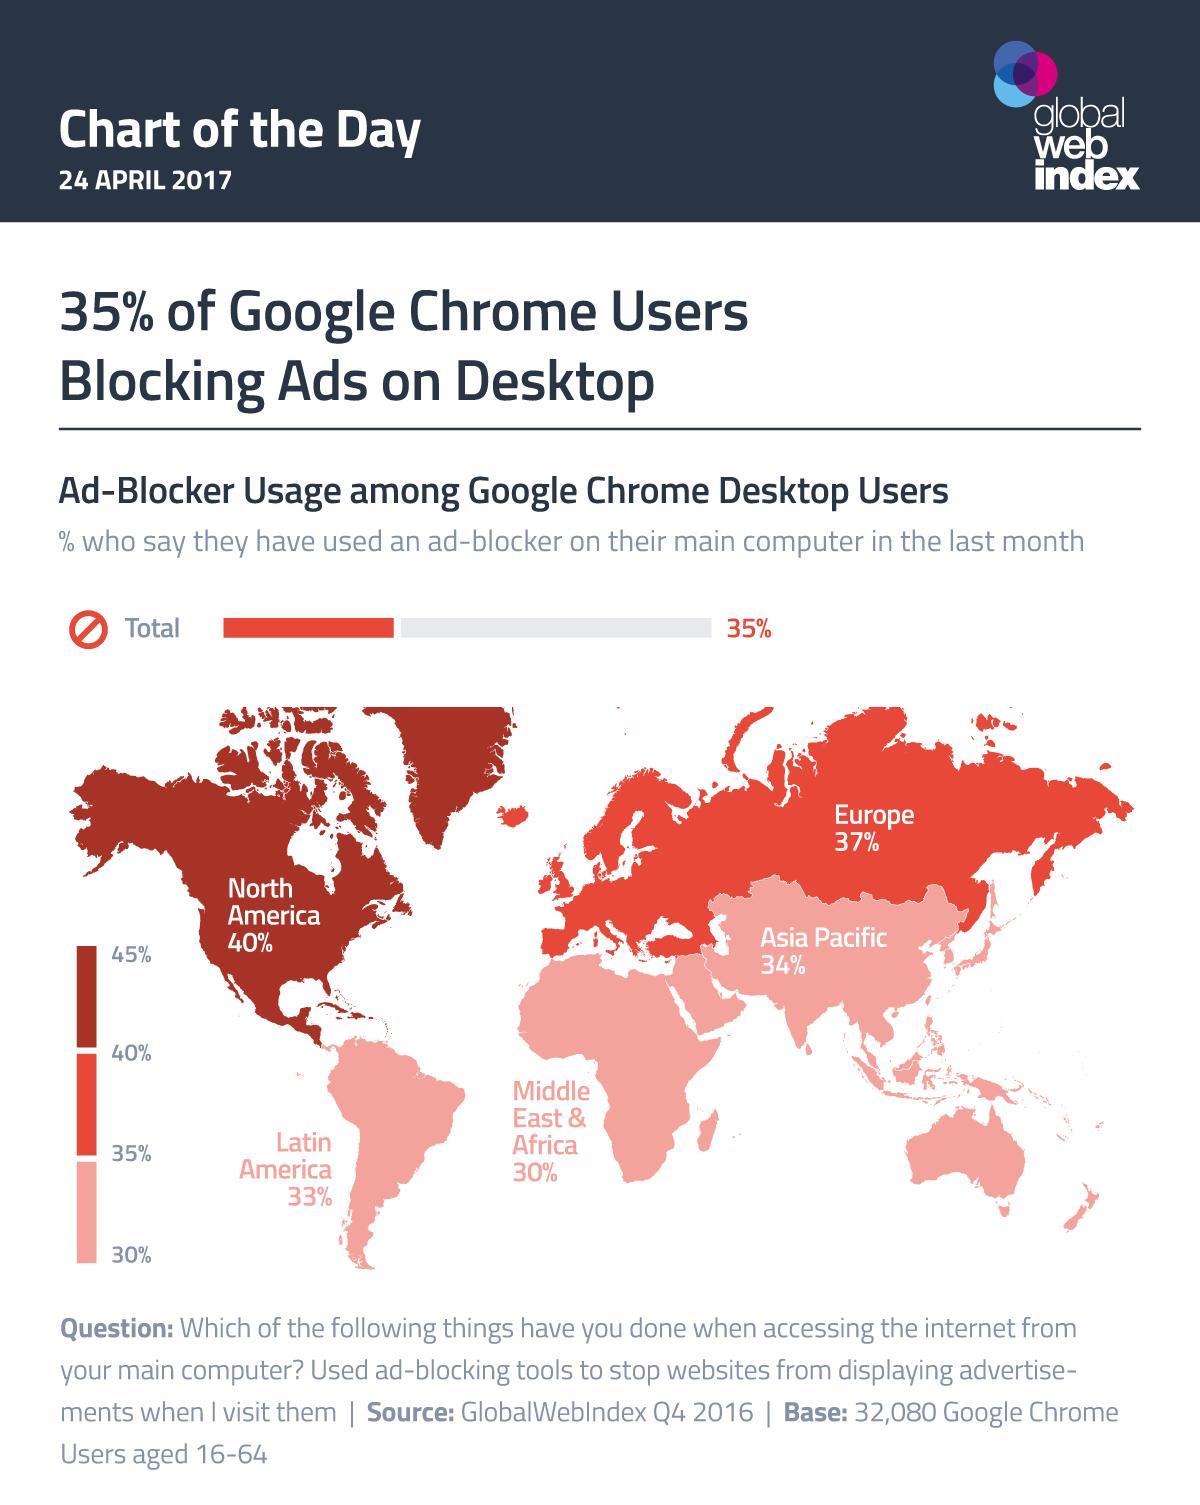 35% of Google Chrome Users Blocking Ads on Desktop